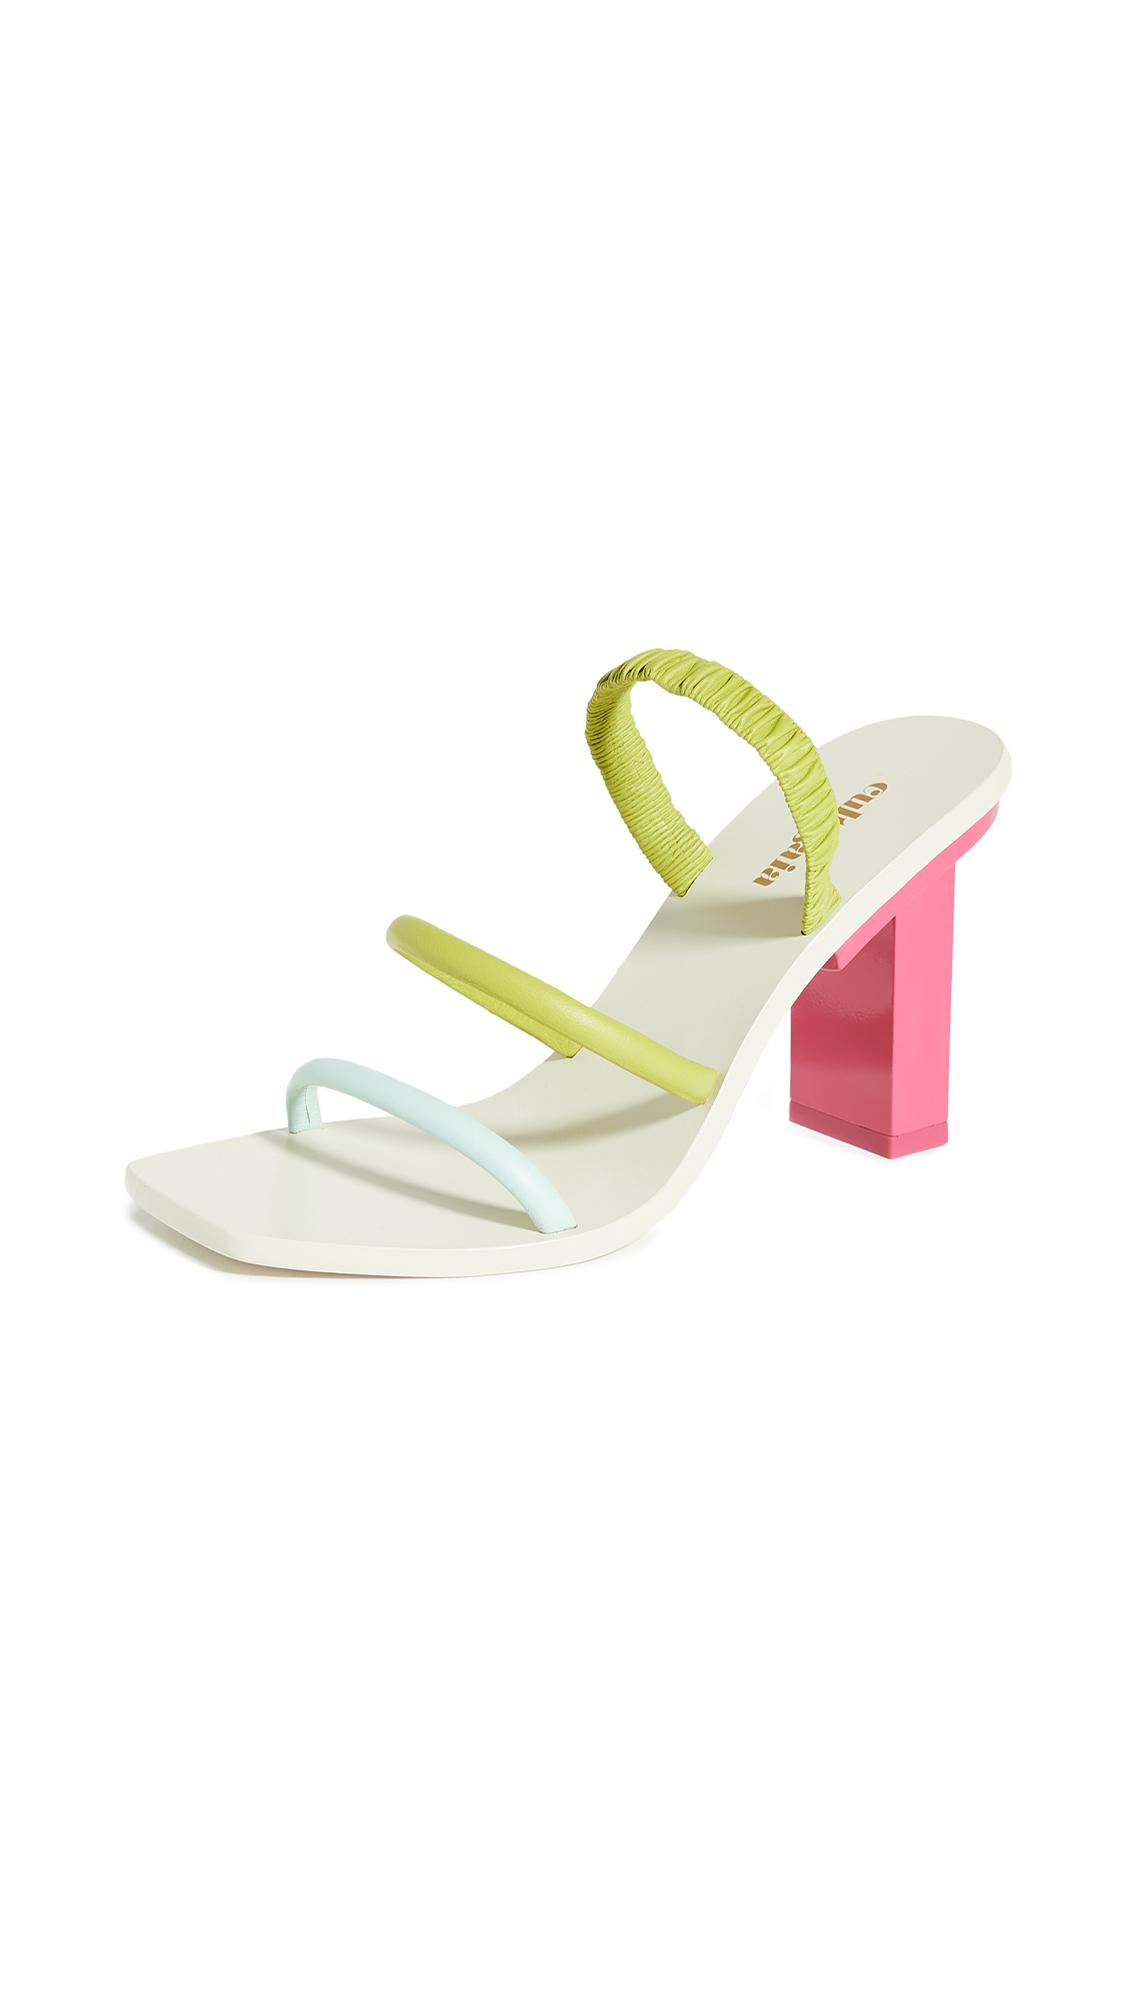 Cult Gaia Kaia Heel Sandals - 30% Off Sale